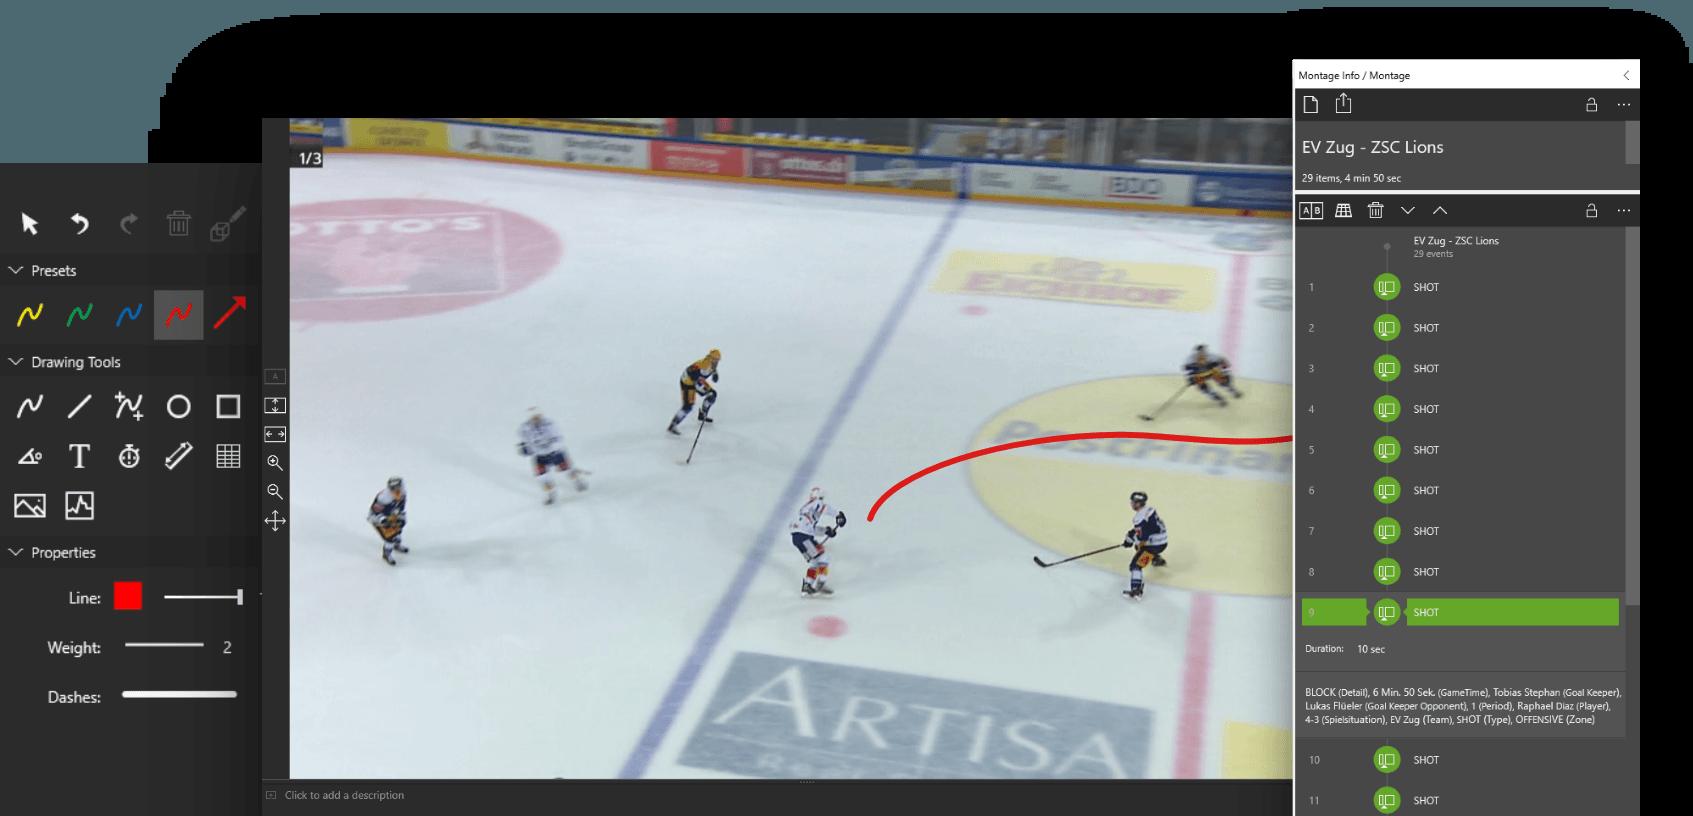 Dartfish - Ice Hockey Teams Worldwide Trust & Use Dartfish